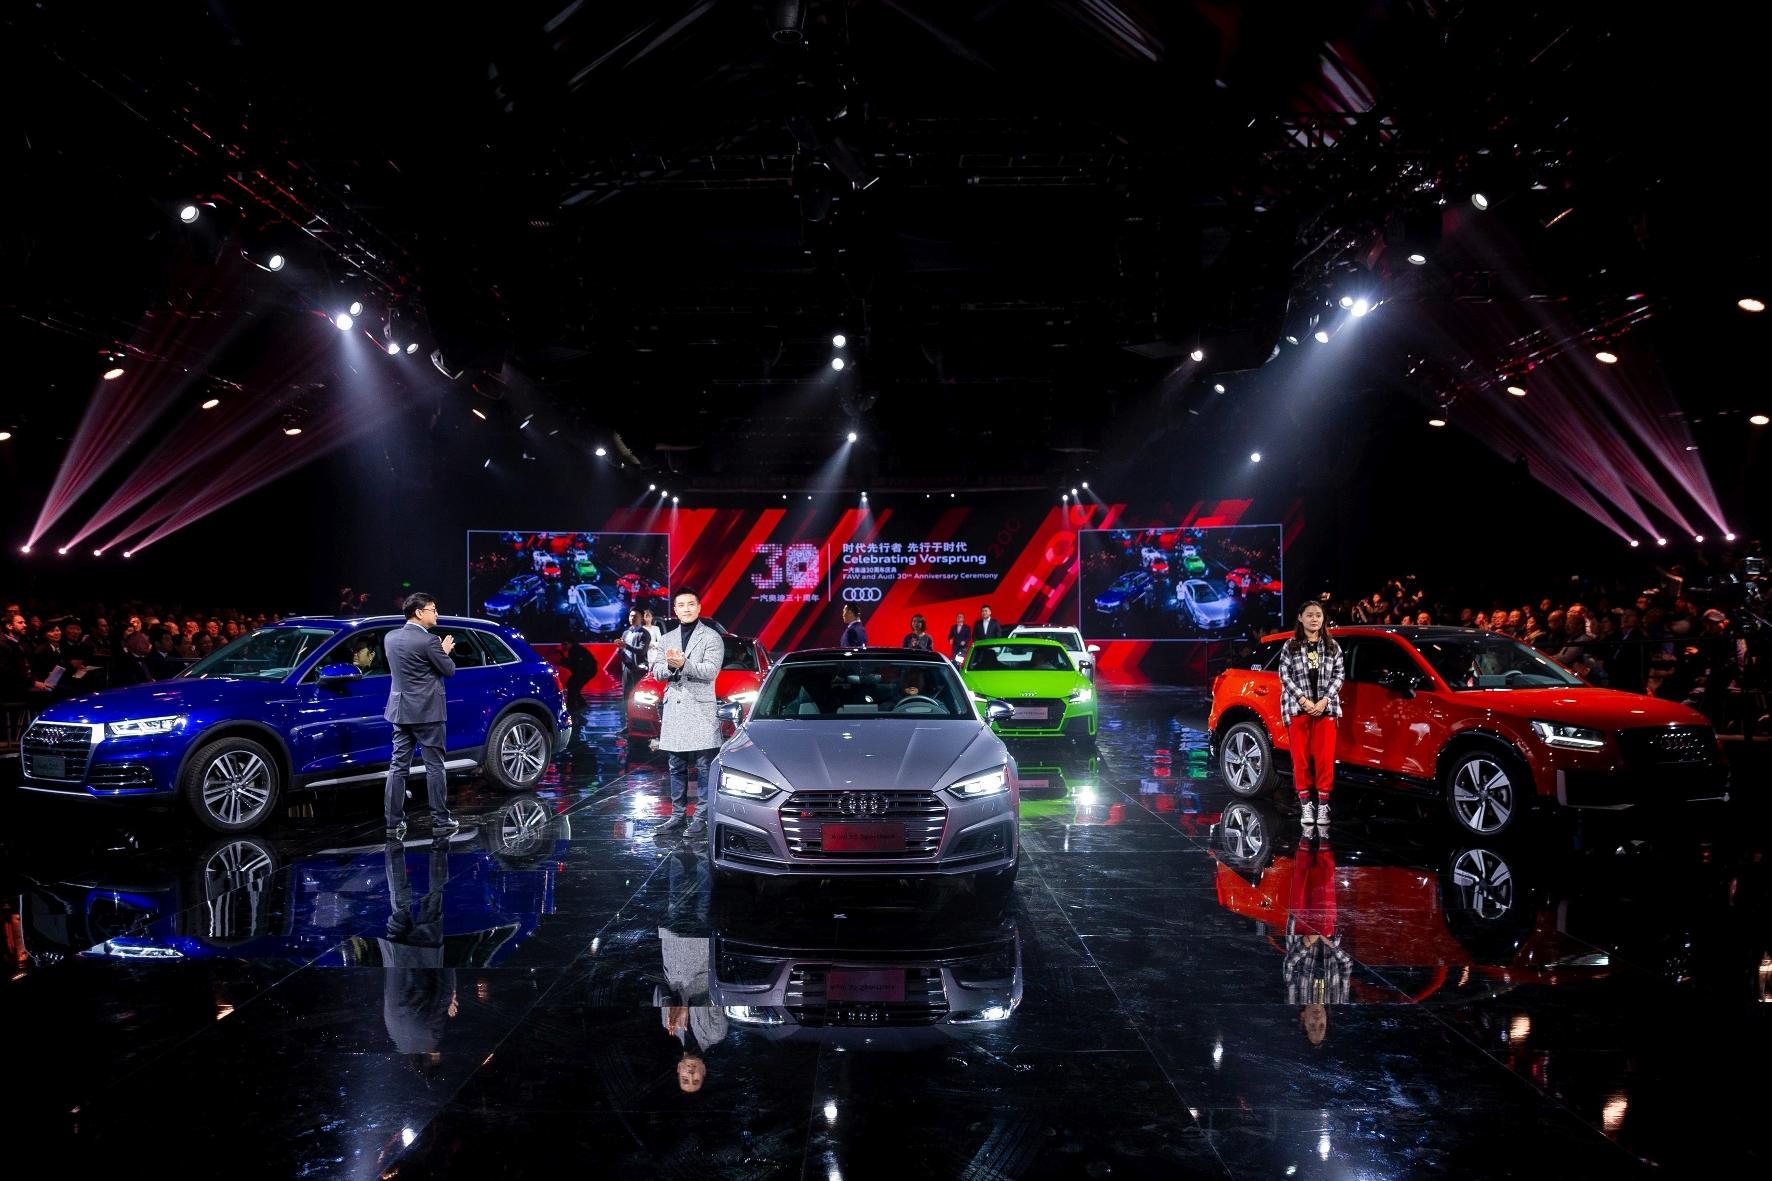 mid Groß-Gerau - Audi muss im November 2018 einen deutlichen Absatz-Rückgang verkraften. Audi